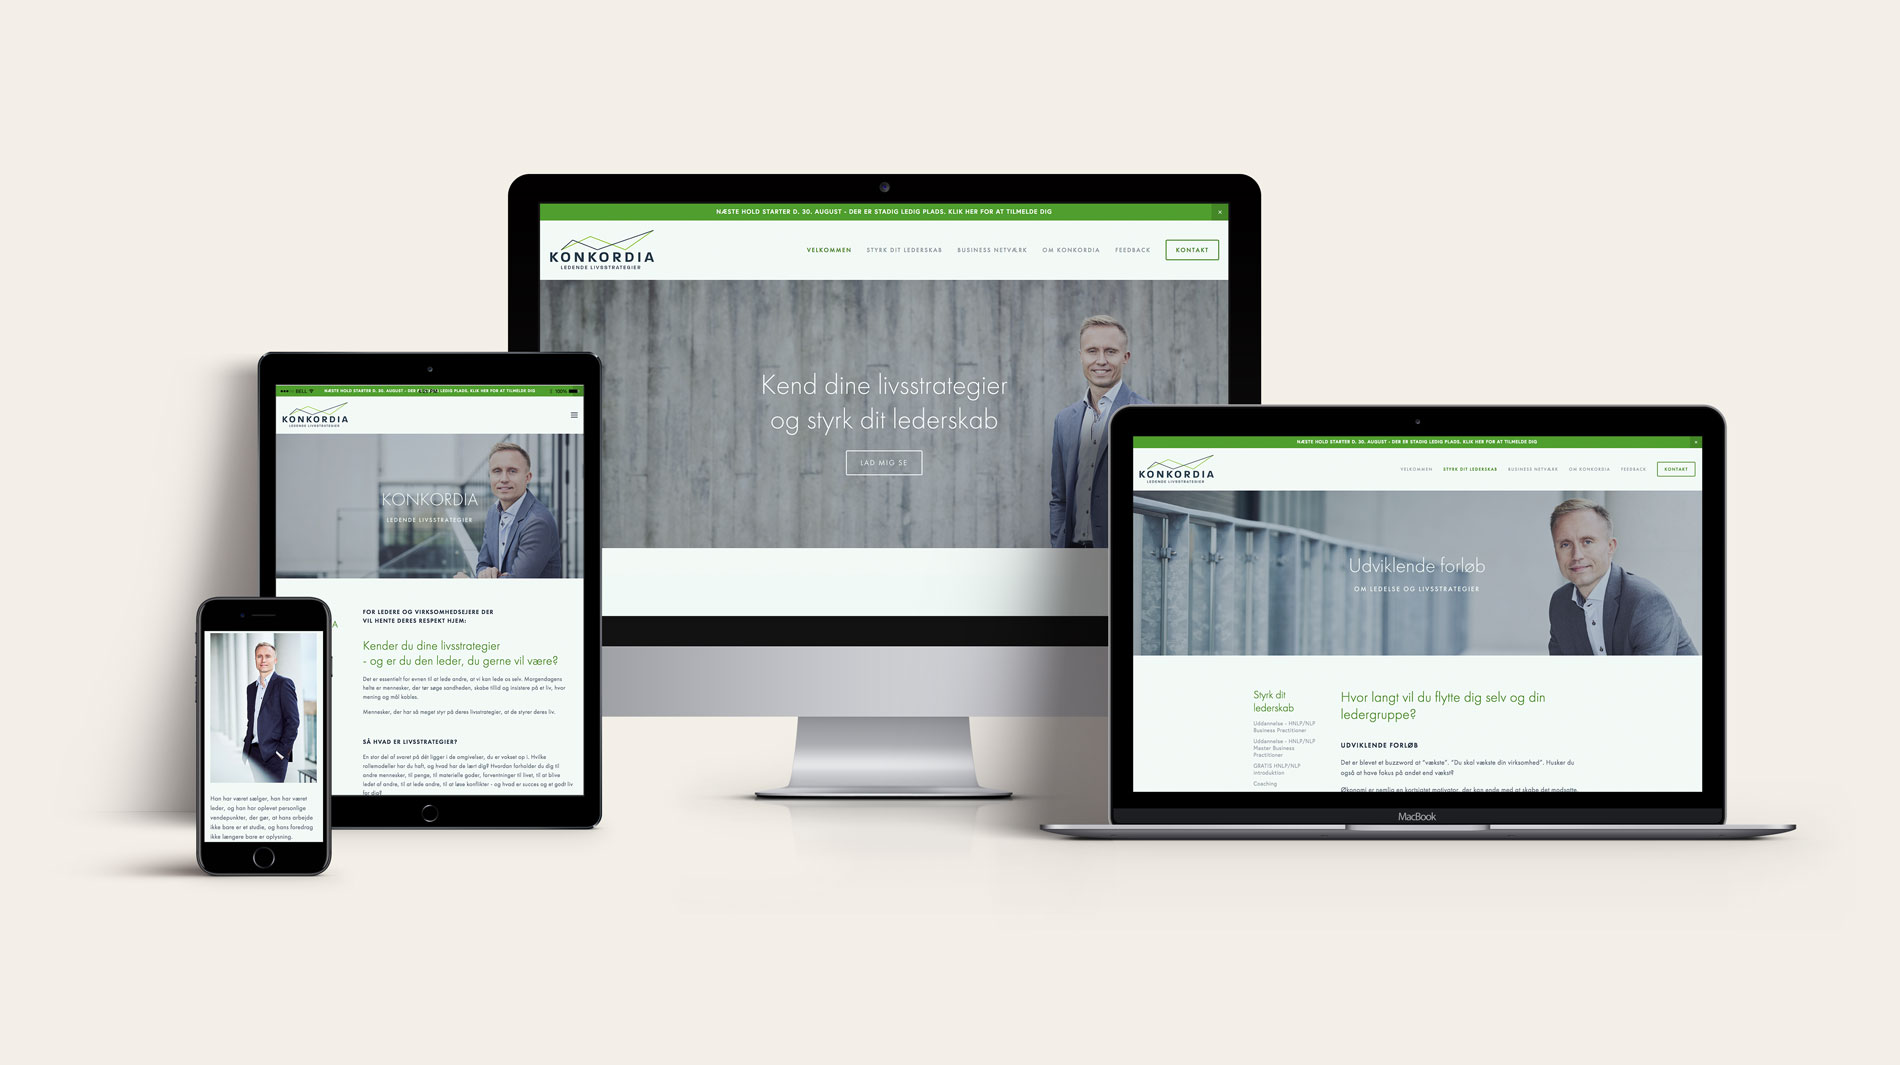 Konkordia-Web-Showcase.jpg